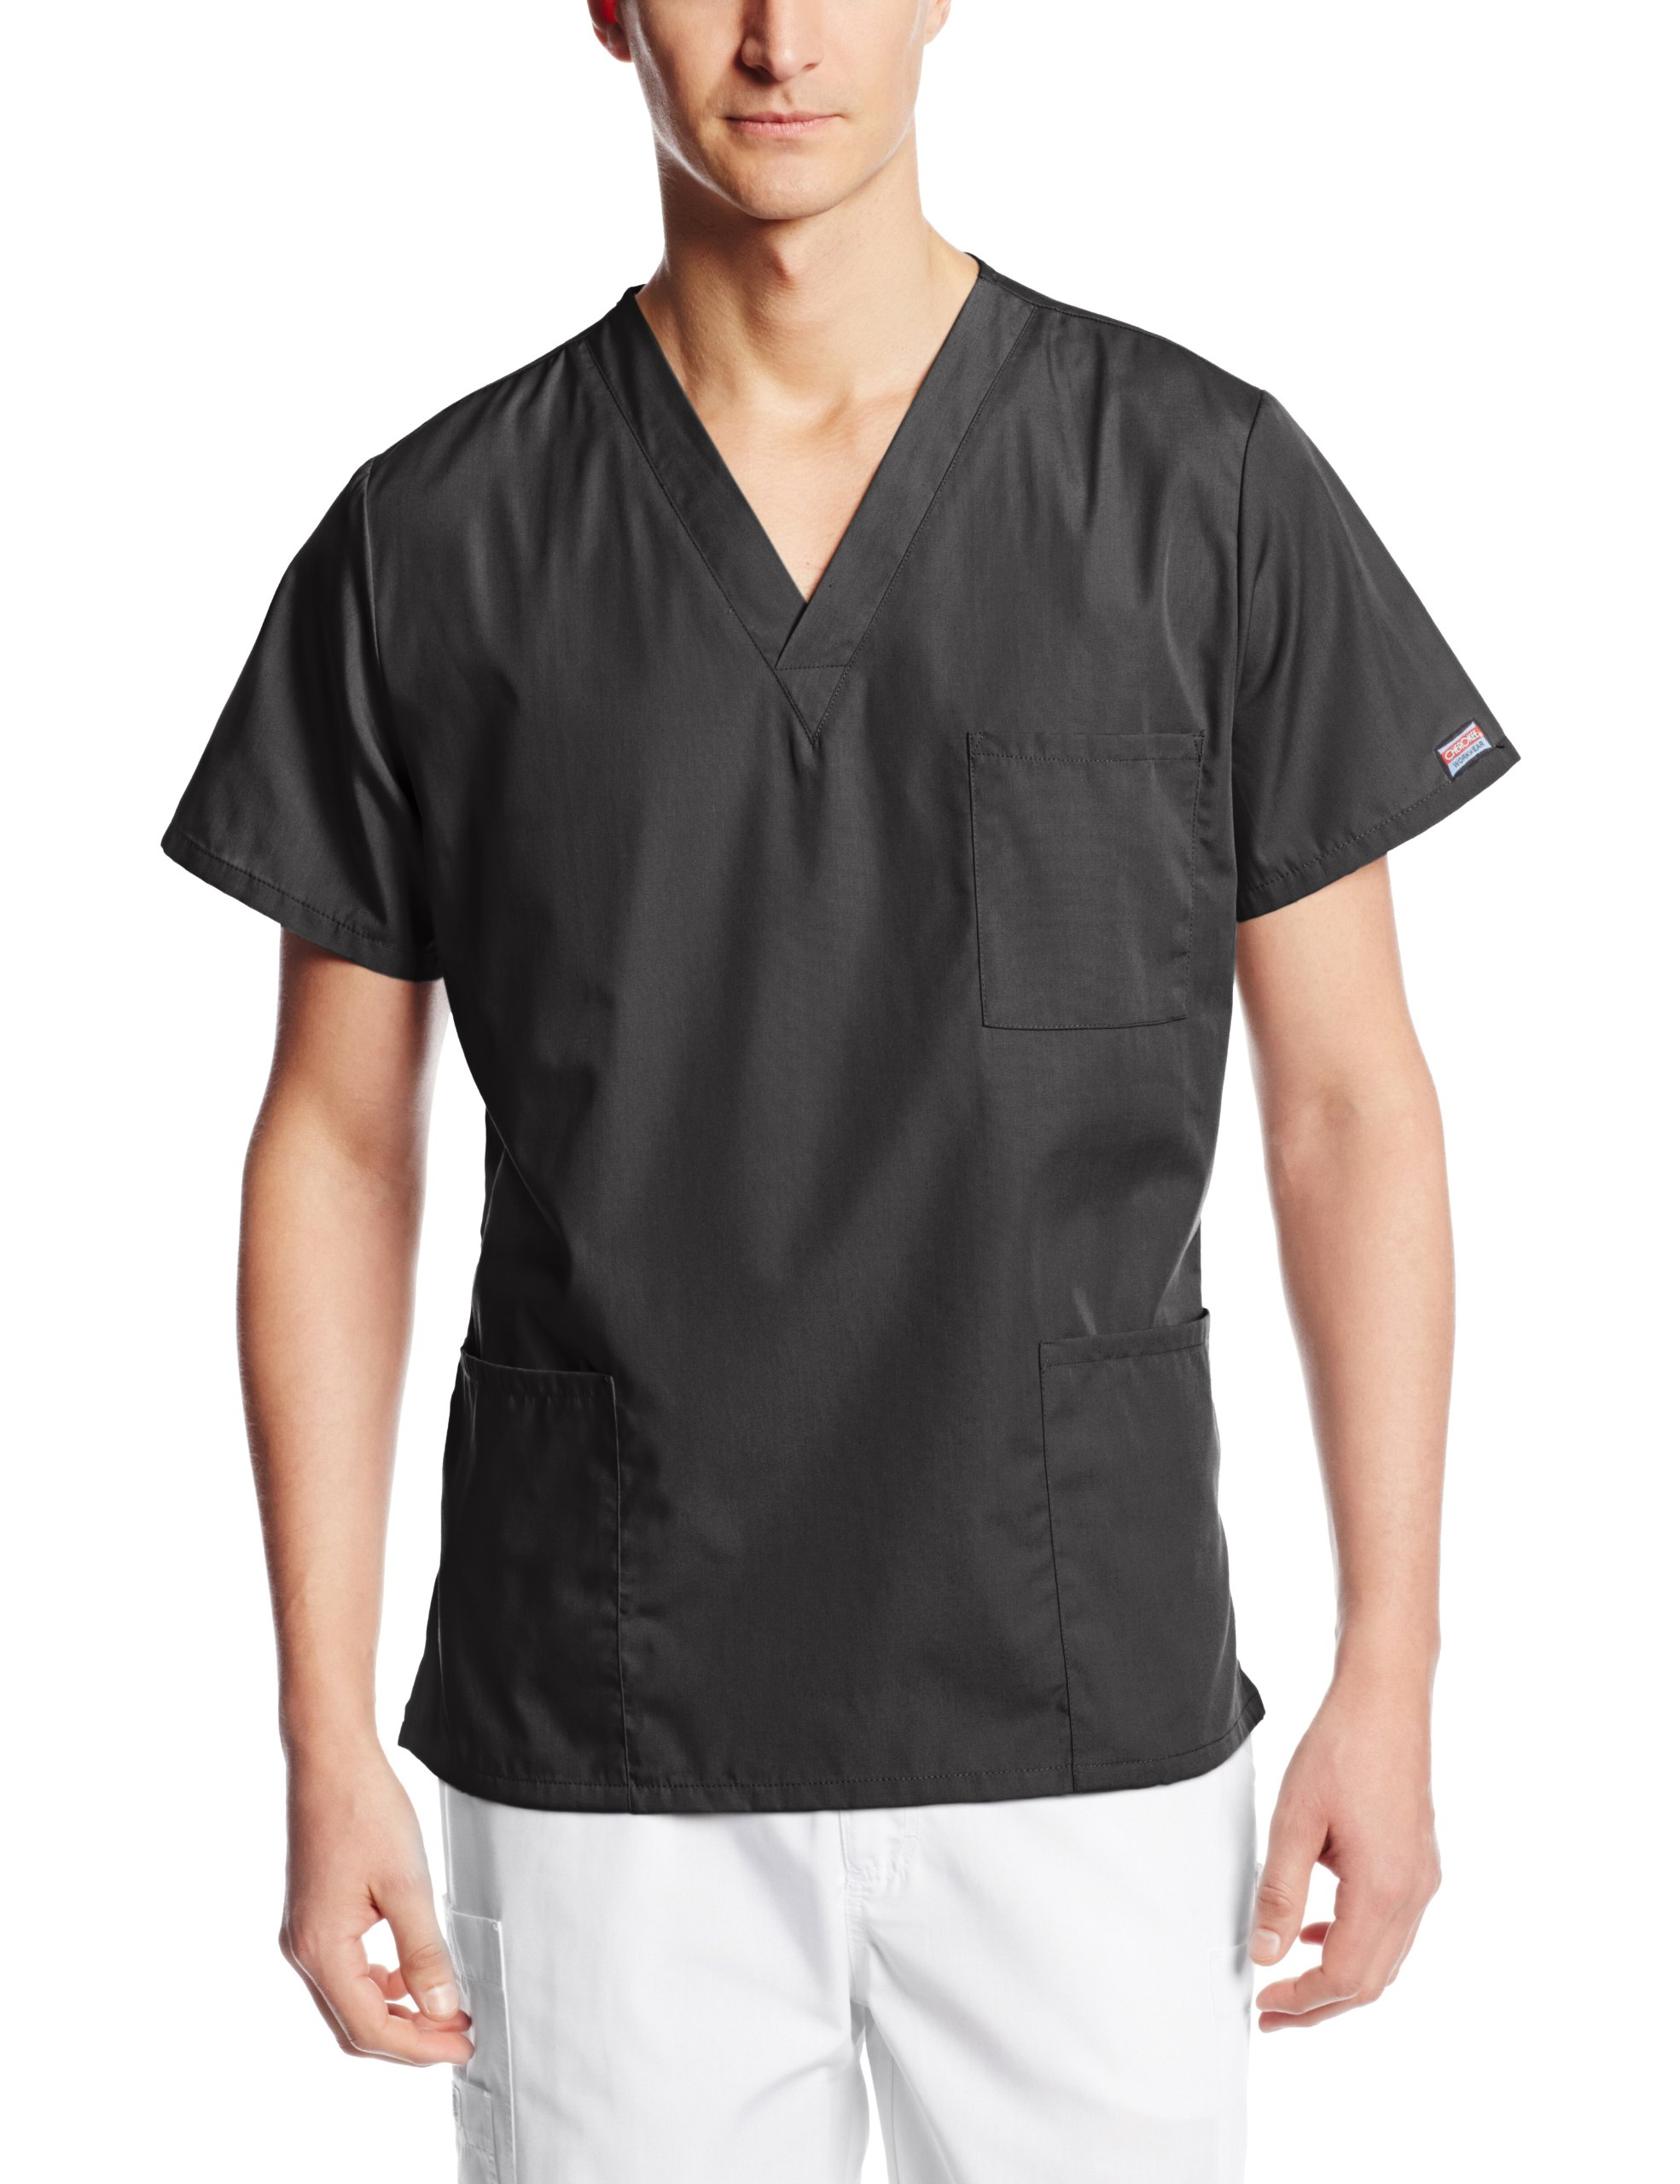 Cherokee Workwear Scrubs Unisex V-Neck Top, Black, X-Large